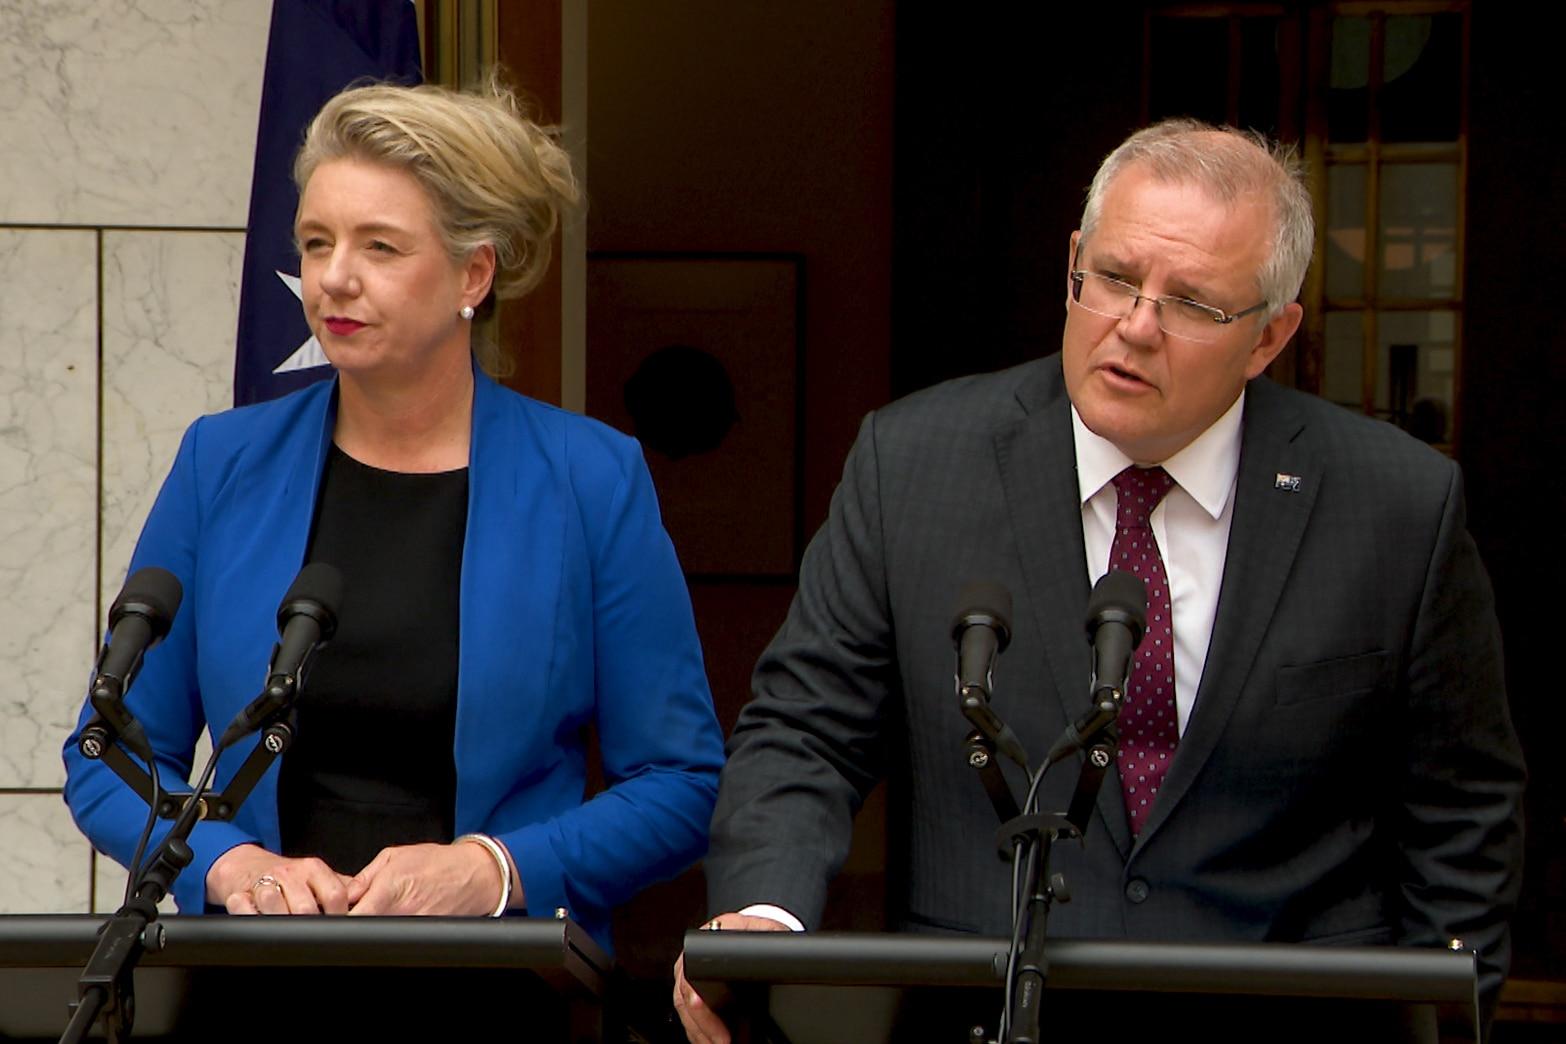 Prime Minister Scott Morrison is due to receive advice on Senator McKenzie.